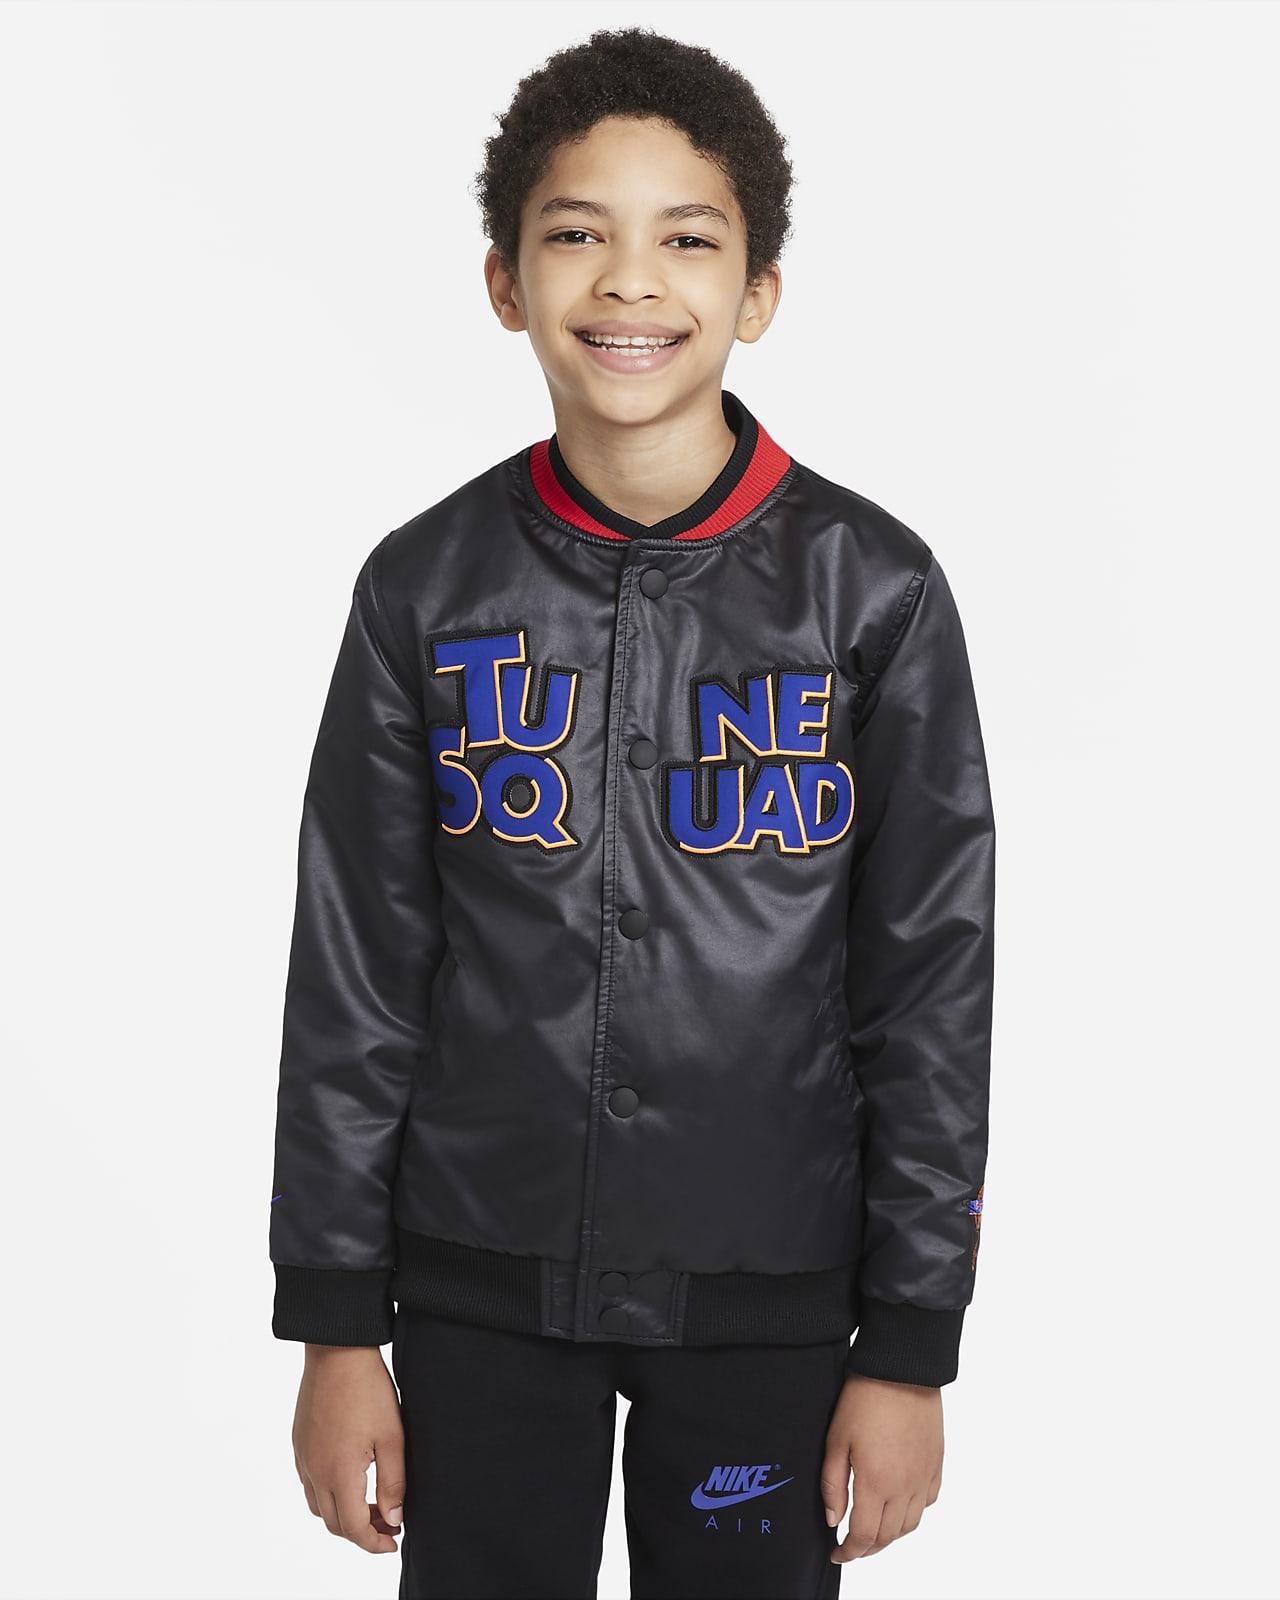 Nike x Space Jam: A New Legacy Big Kids' Jacket